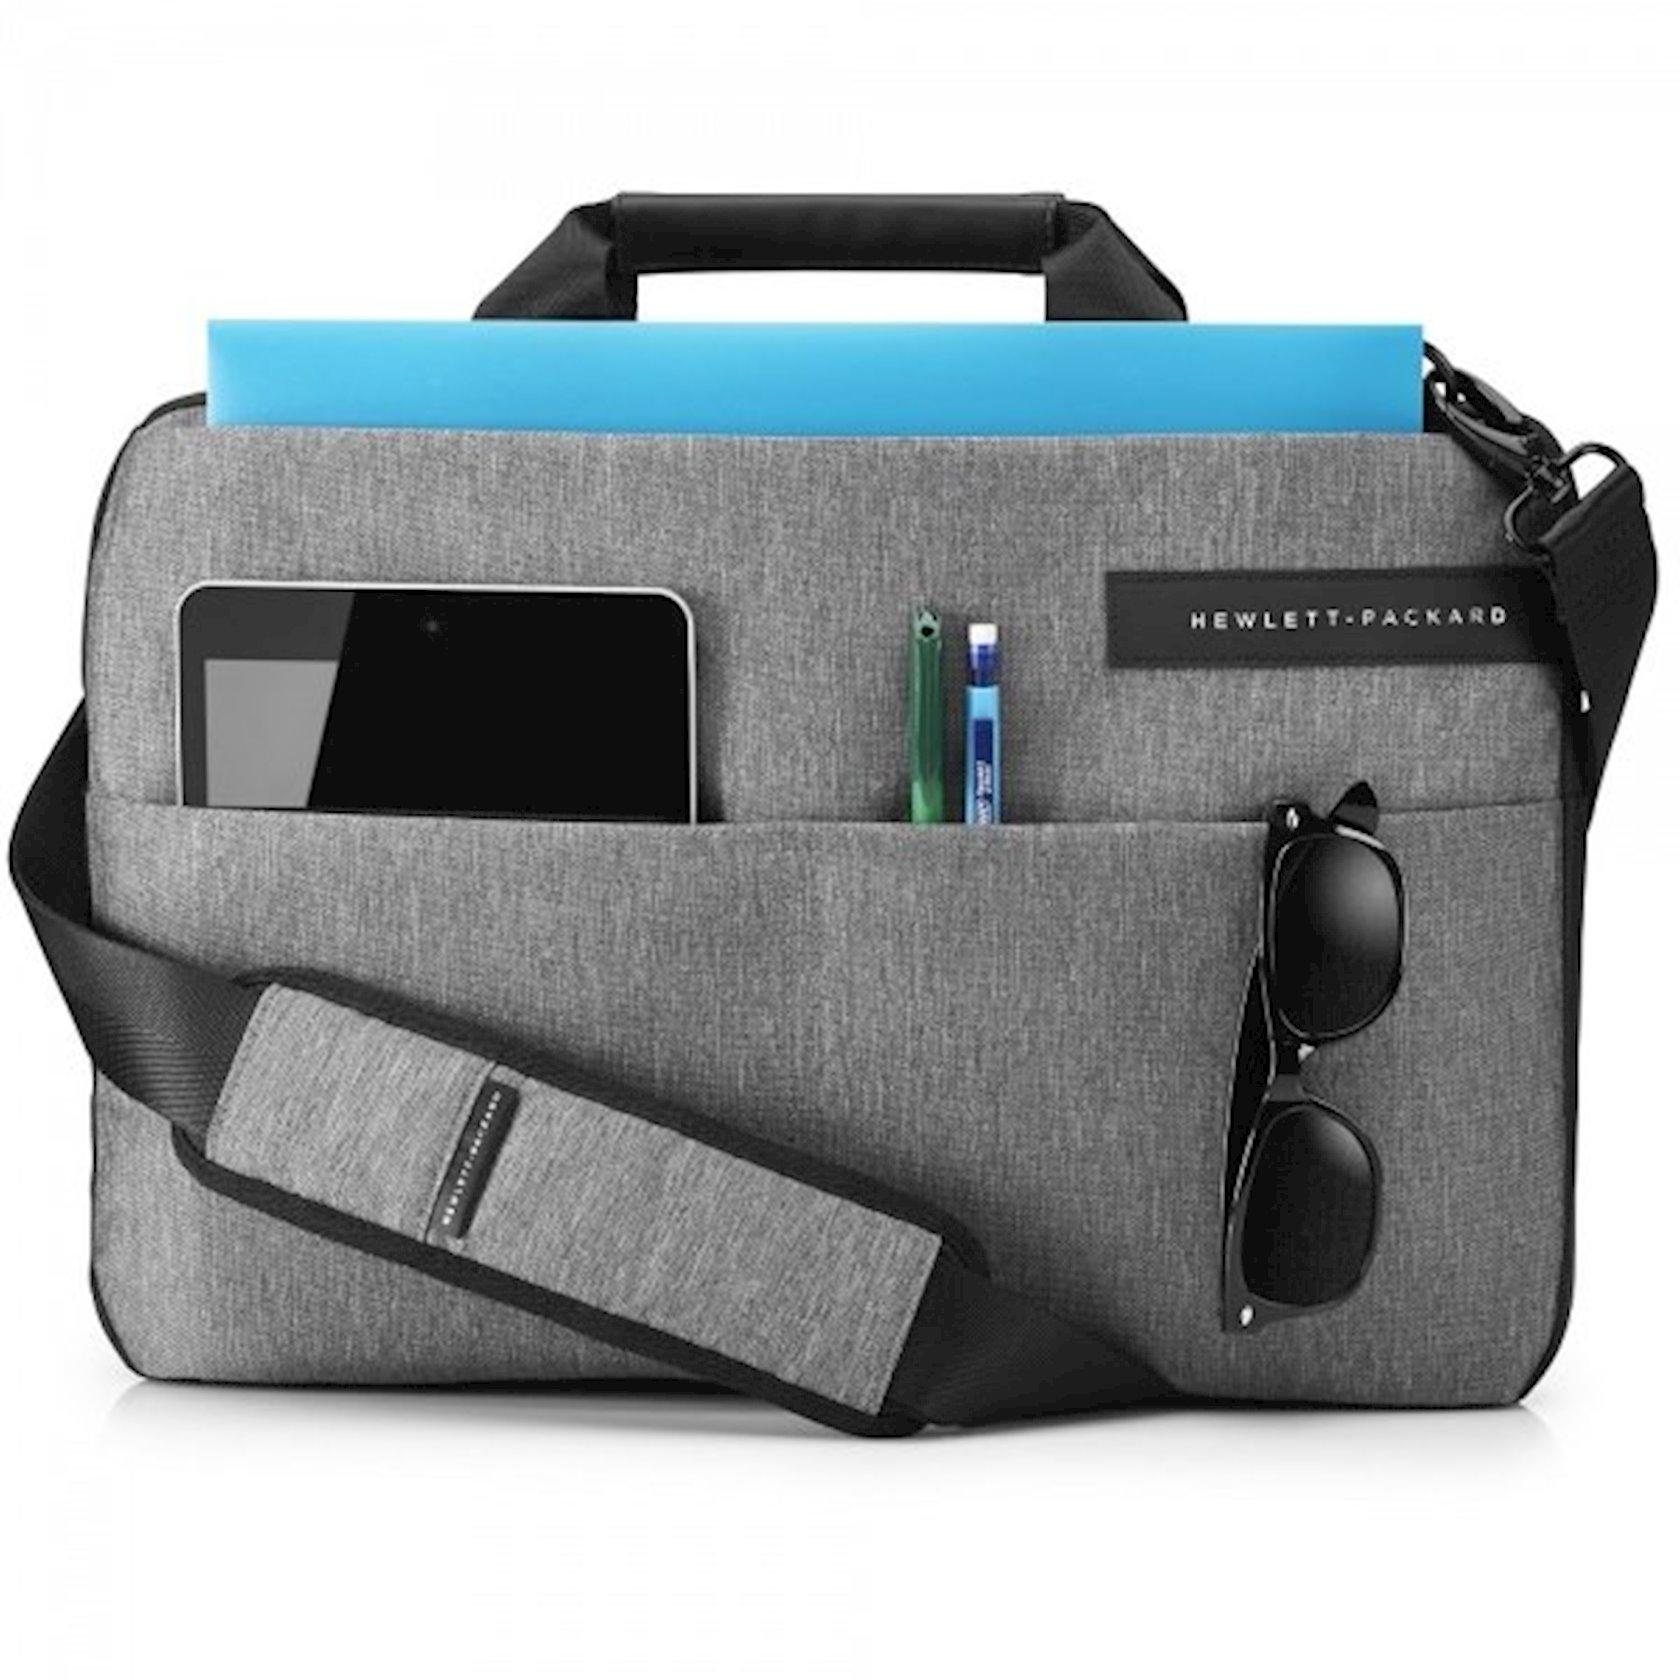 Noutbuk üçün çanta 14 HP Signature Slim Topload, qara/boz